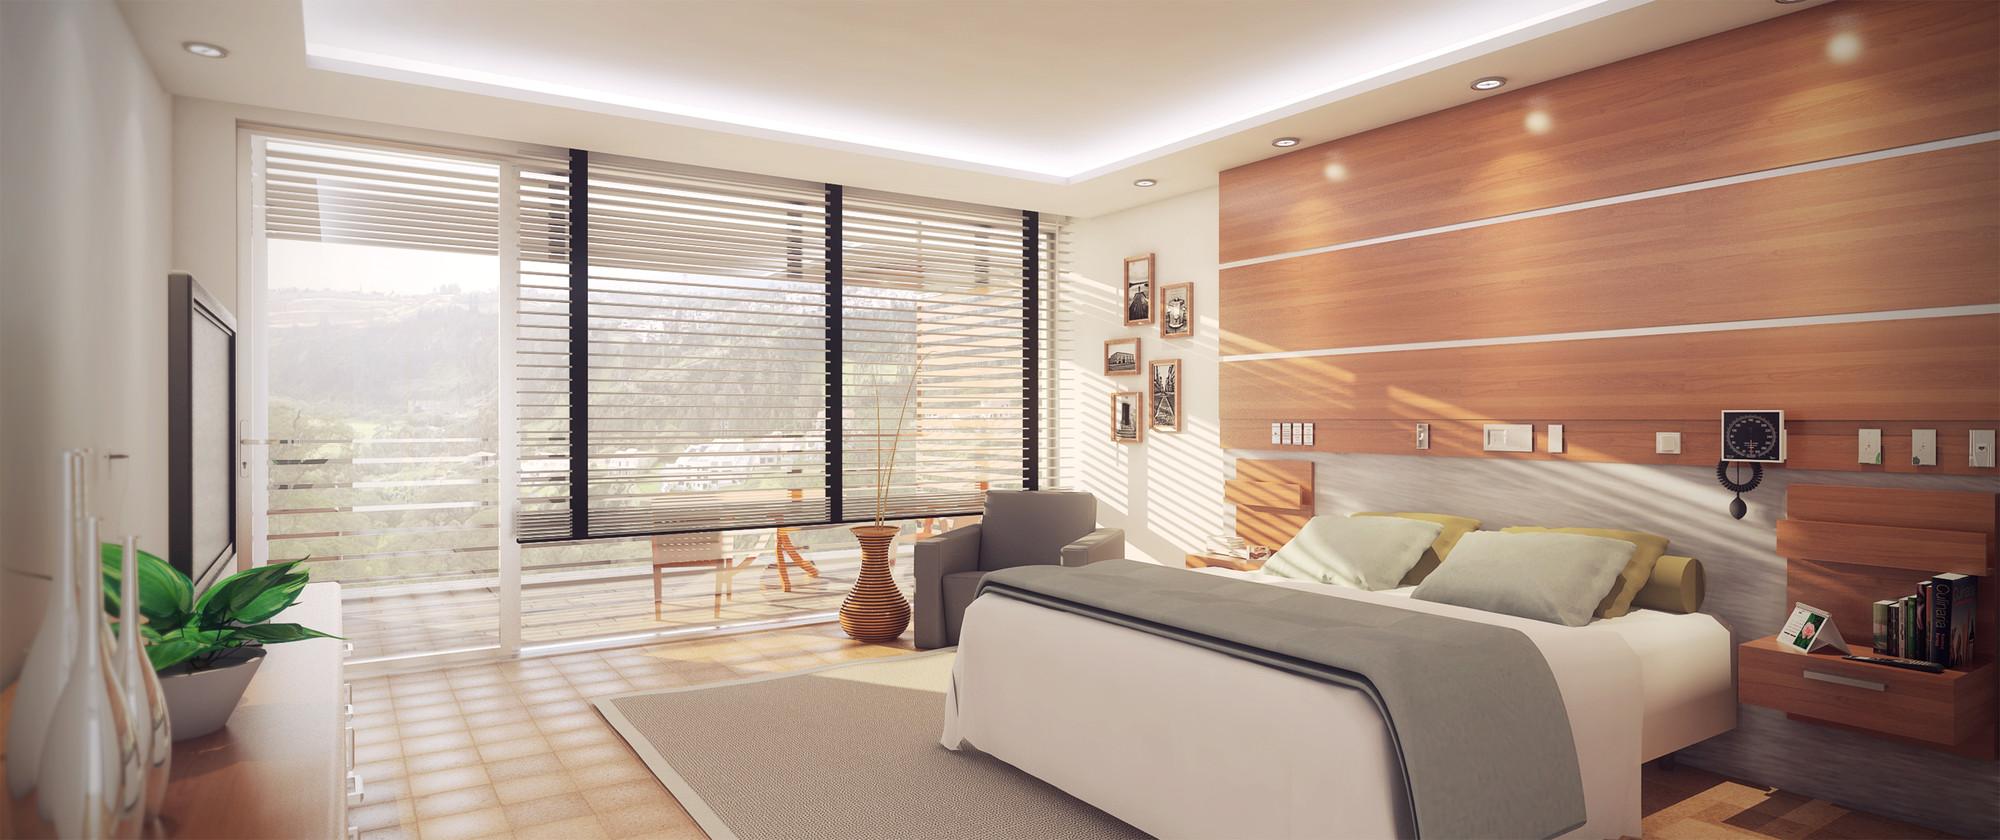 Arq. Liz Illescas. Image Courtesy of Diagonal Arquitectura